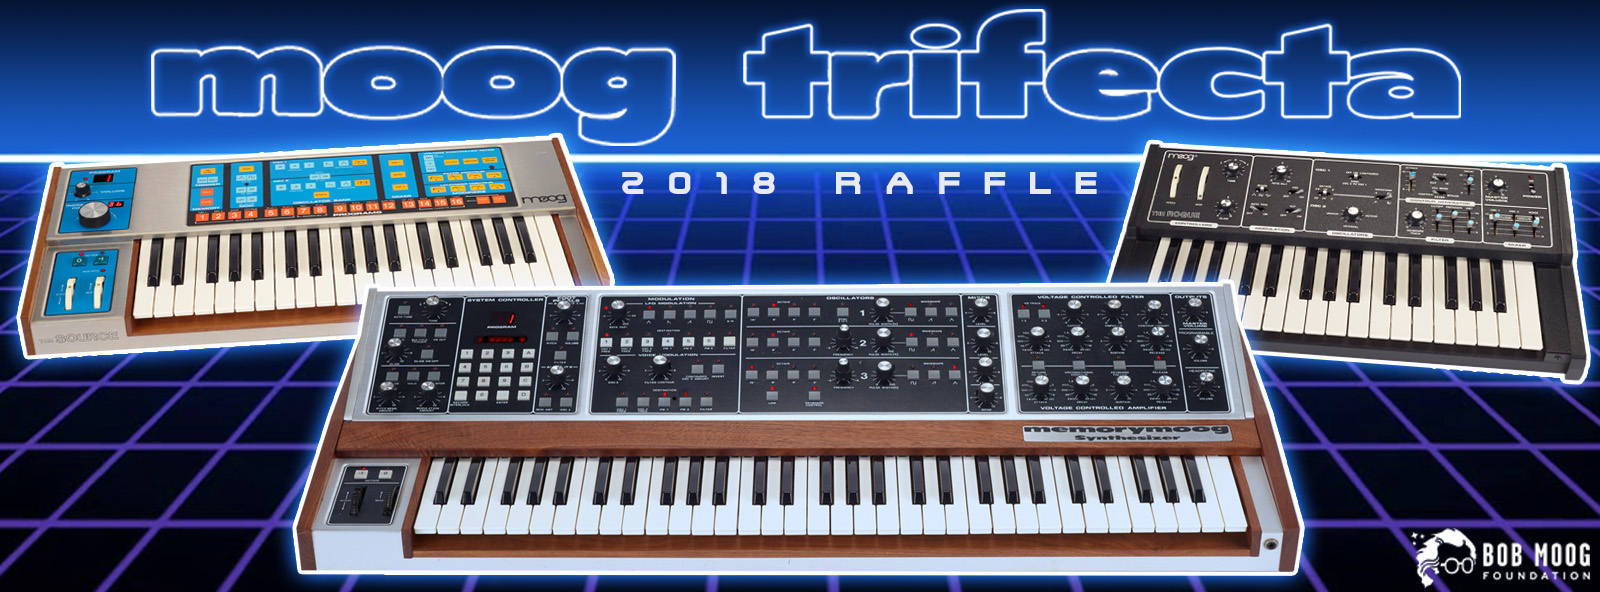 Announcing 2018 Moog Trifecta  Raffle: Memorymoog, Source, and Rogue